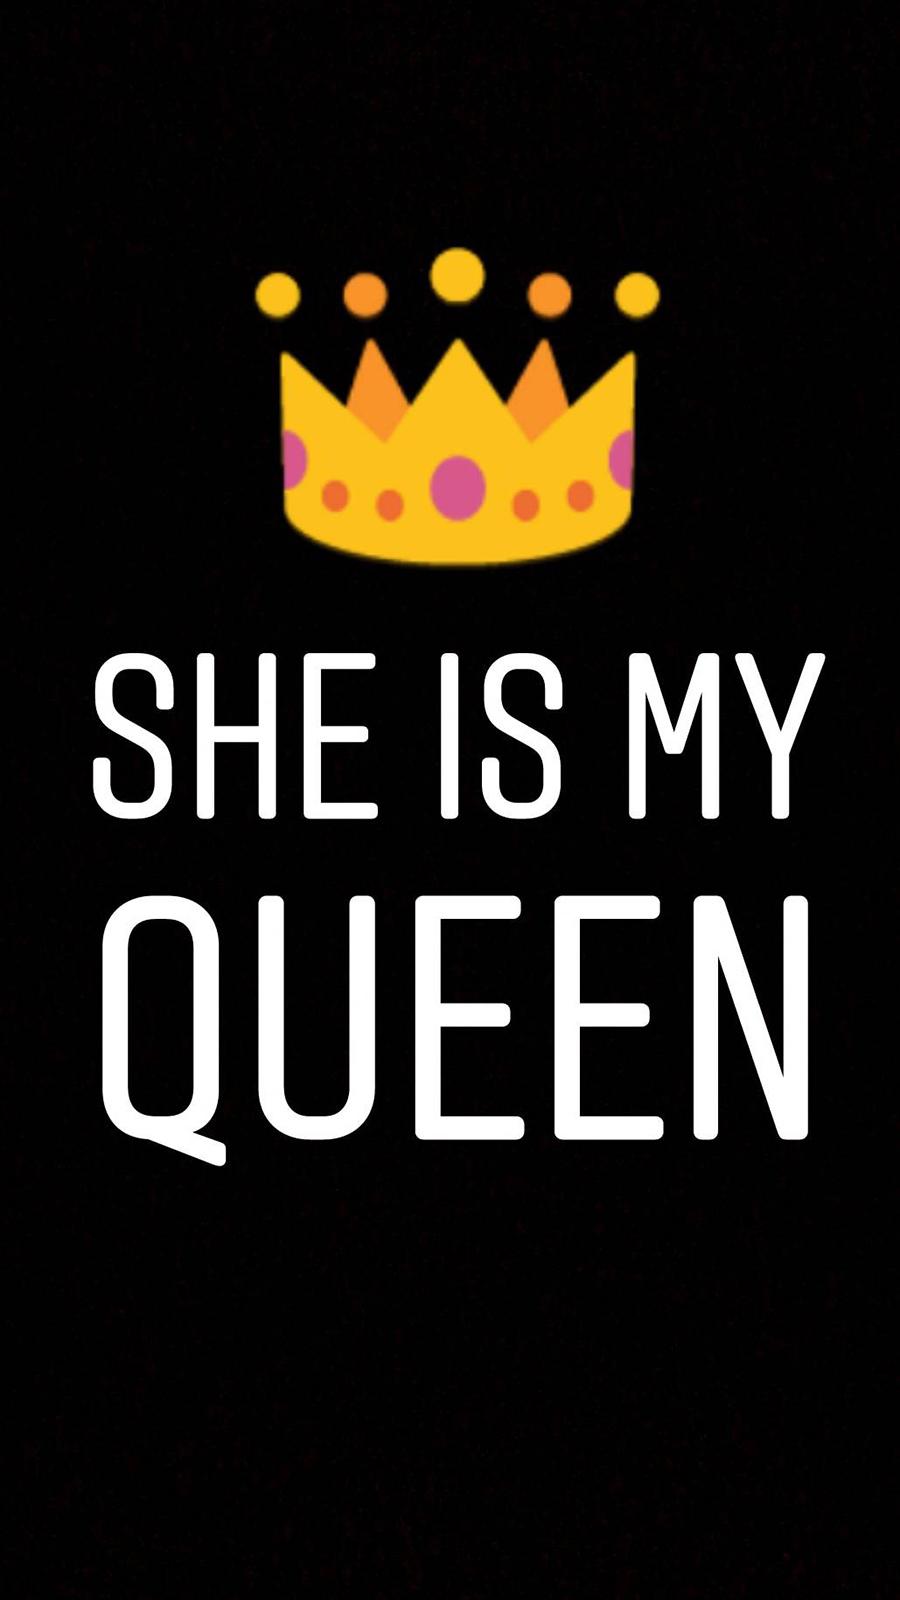 Queen Quotes Wallpapers Download